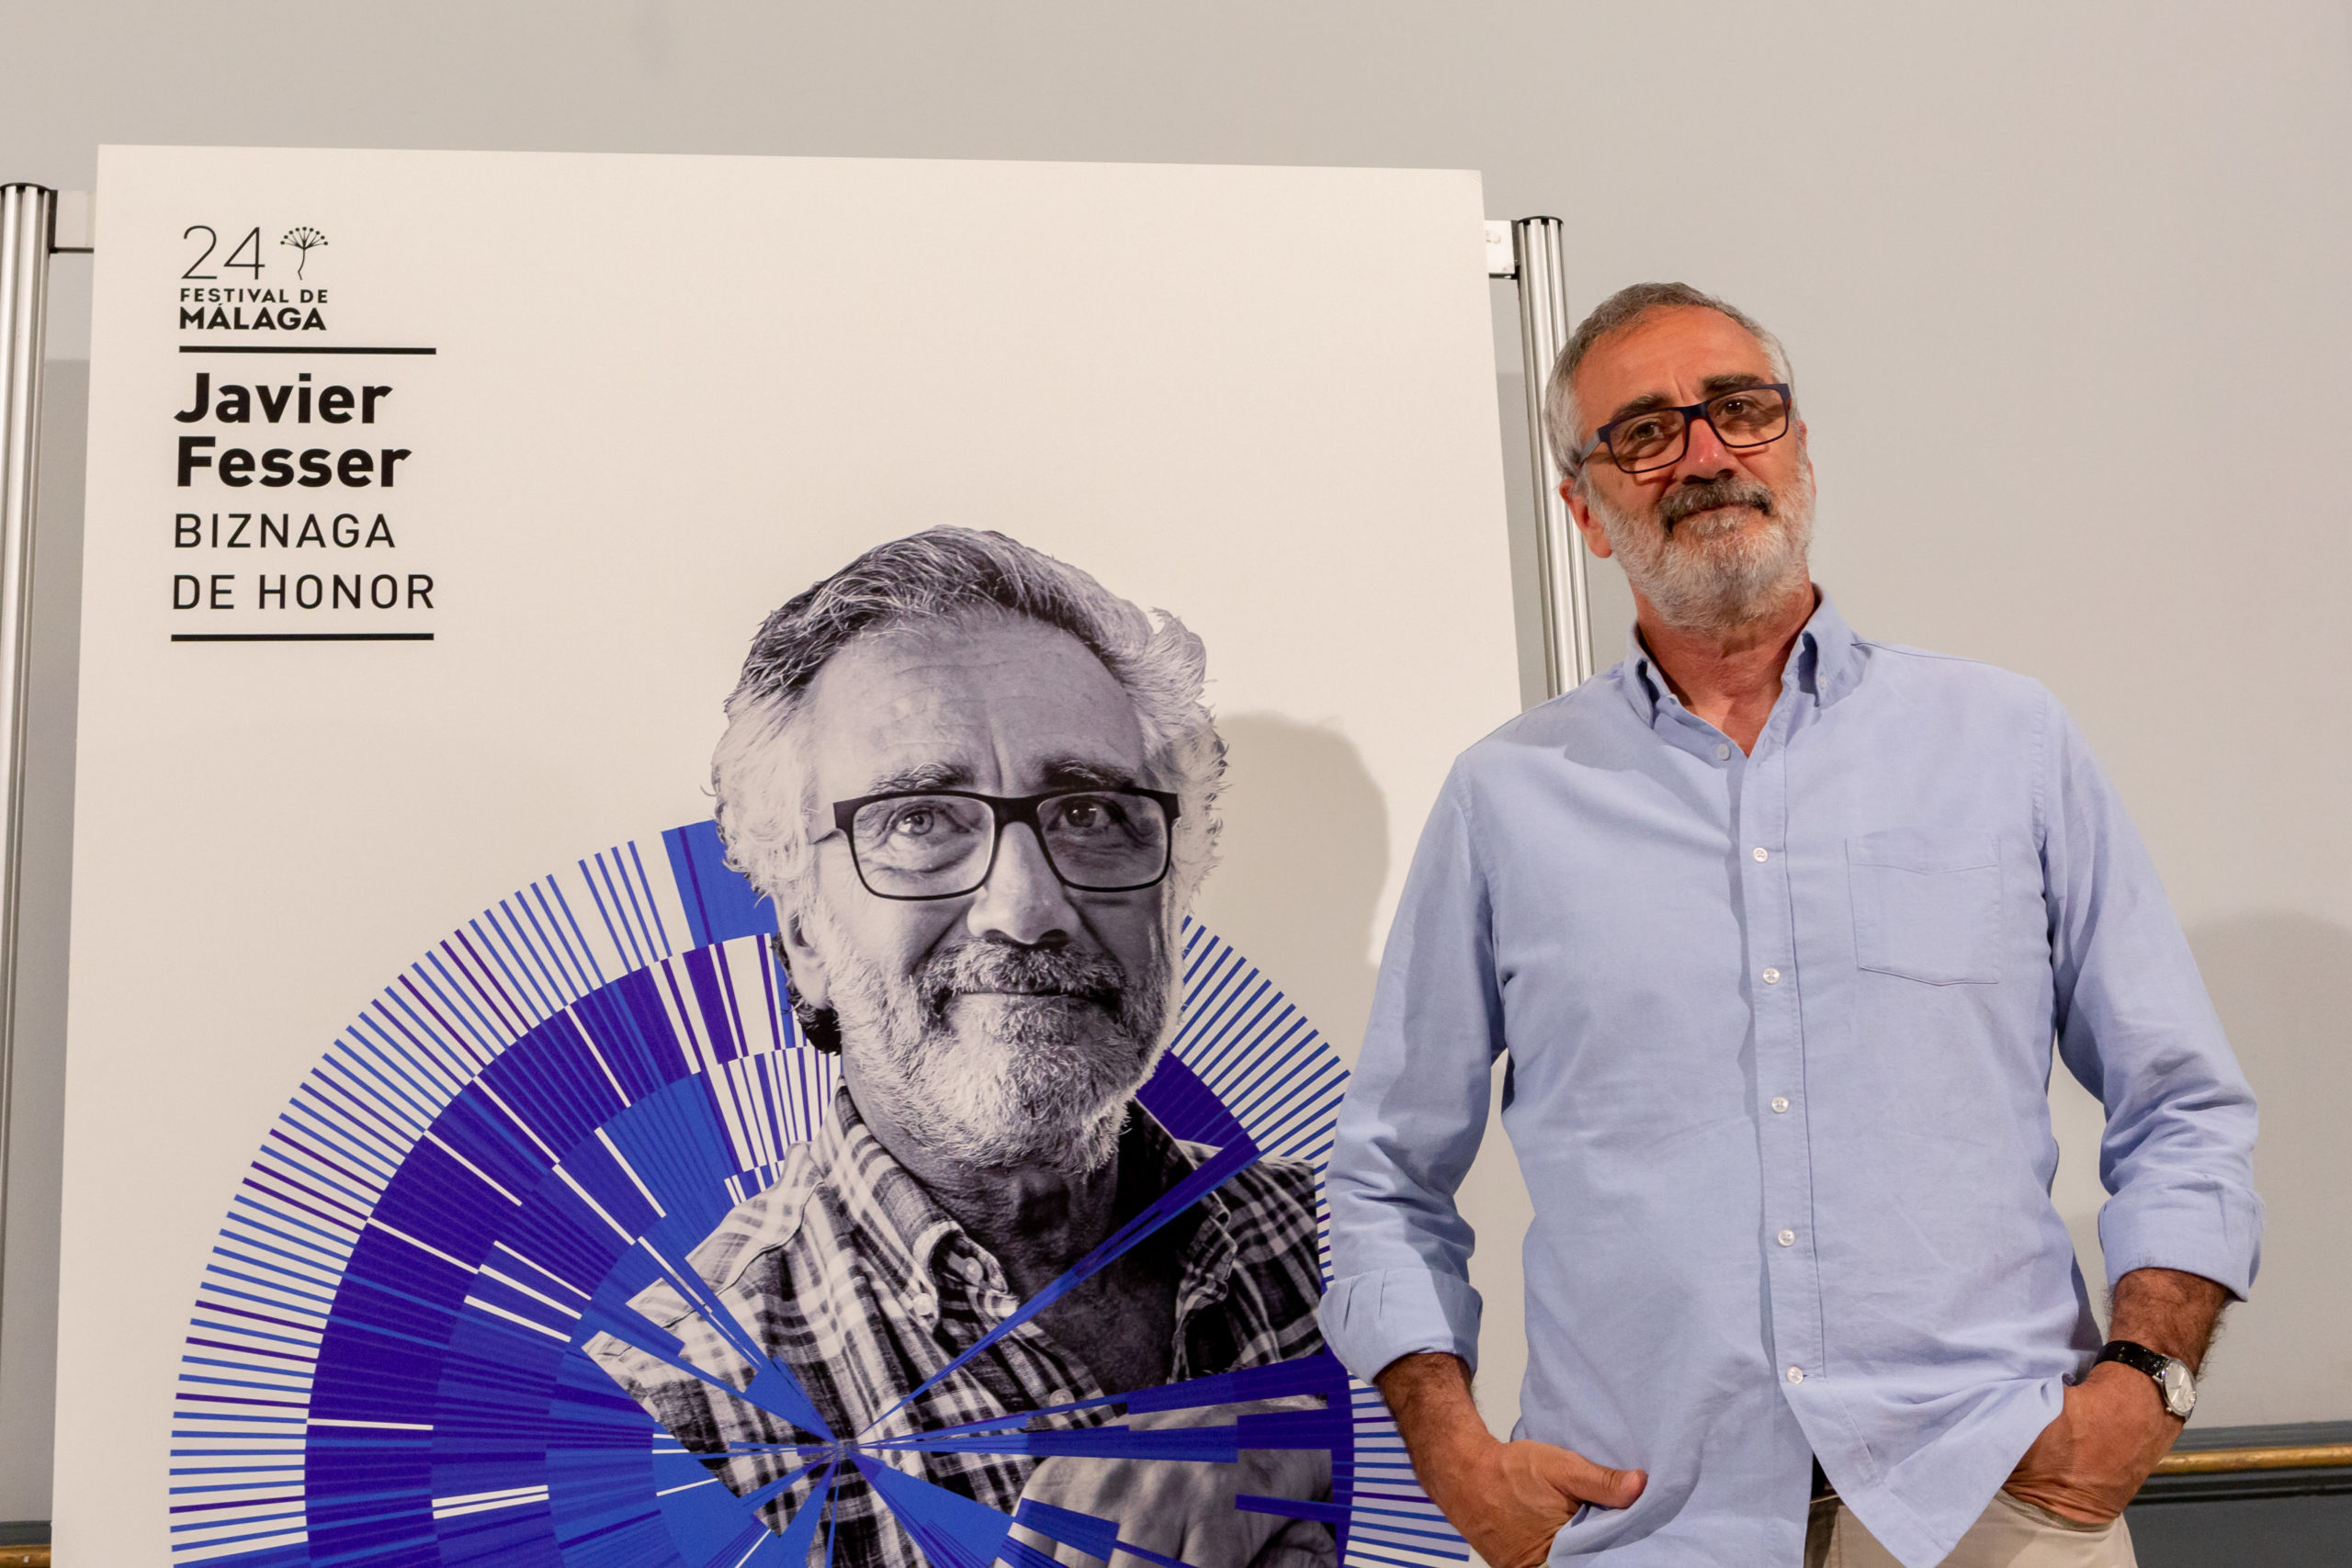 Javier Fesser recibe la Biznaga de Honor en el Festival de Málaga